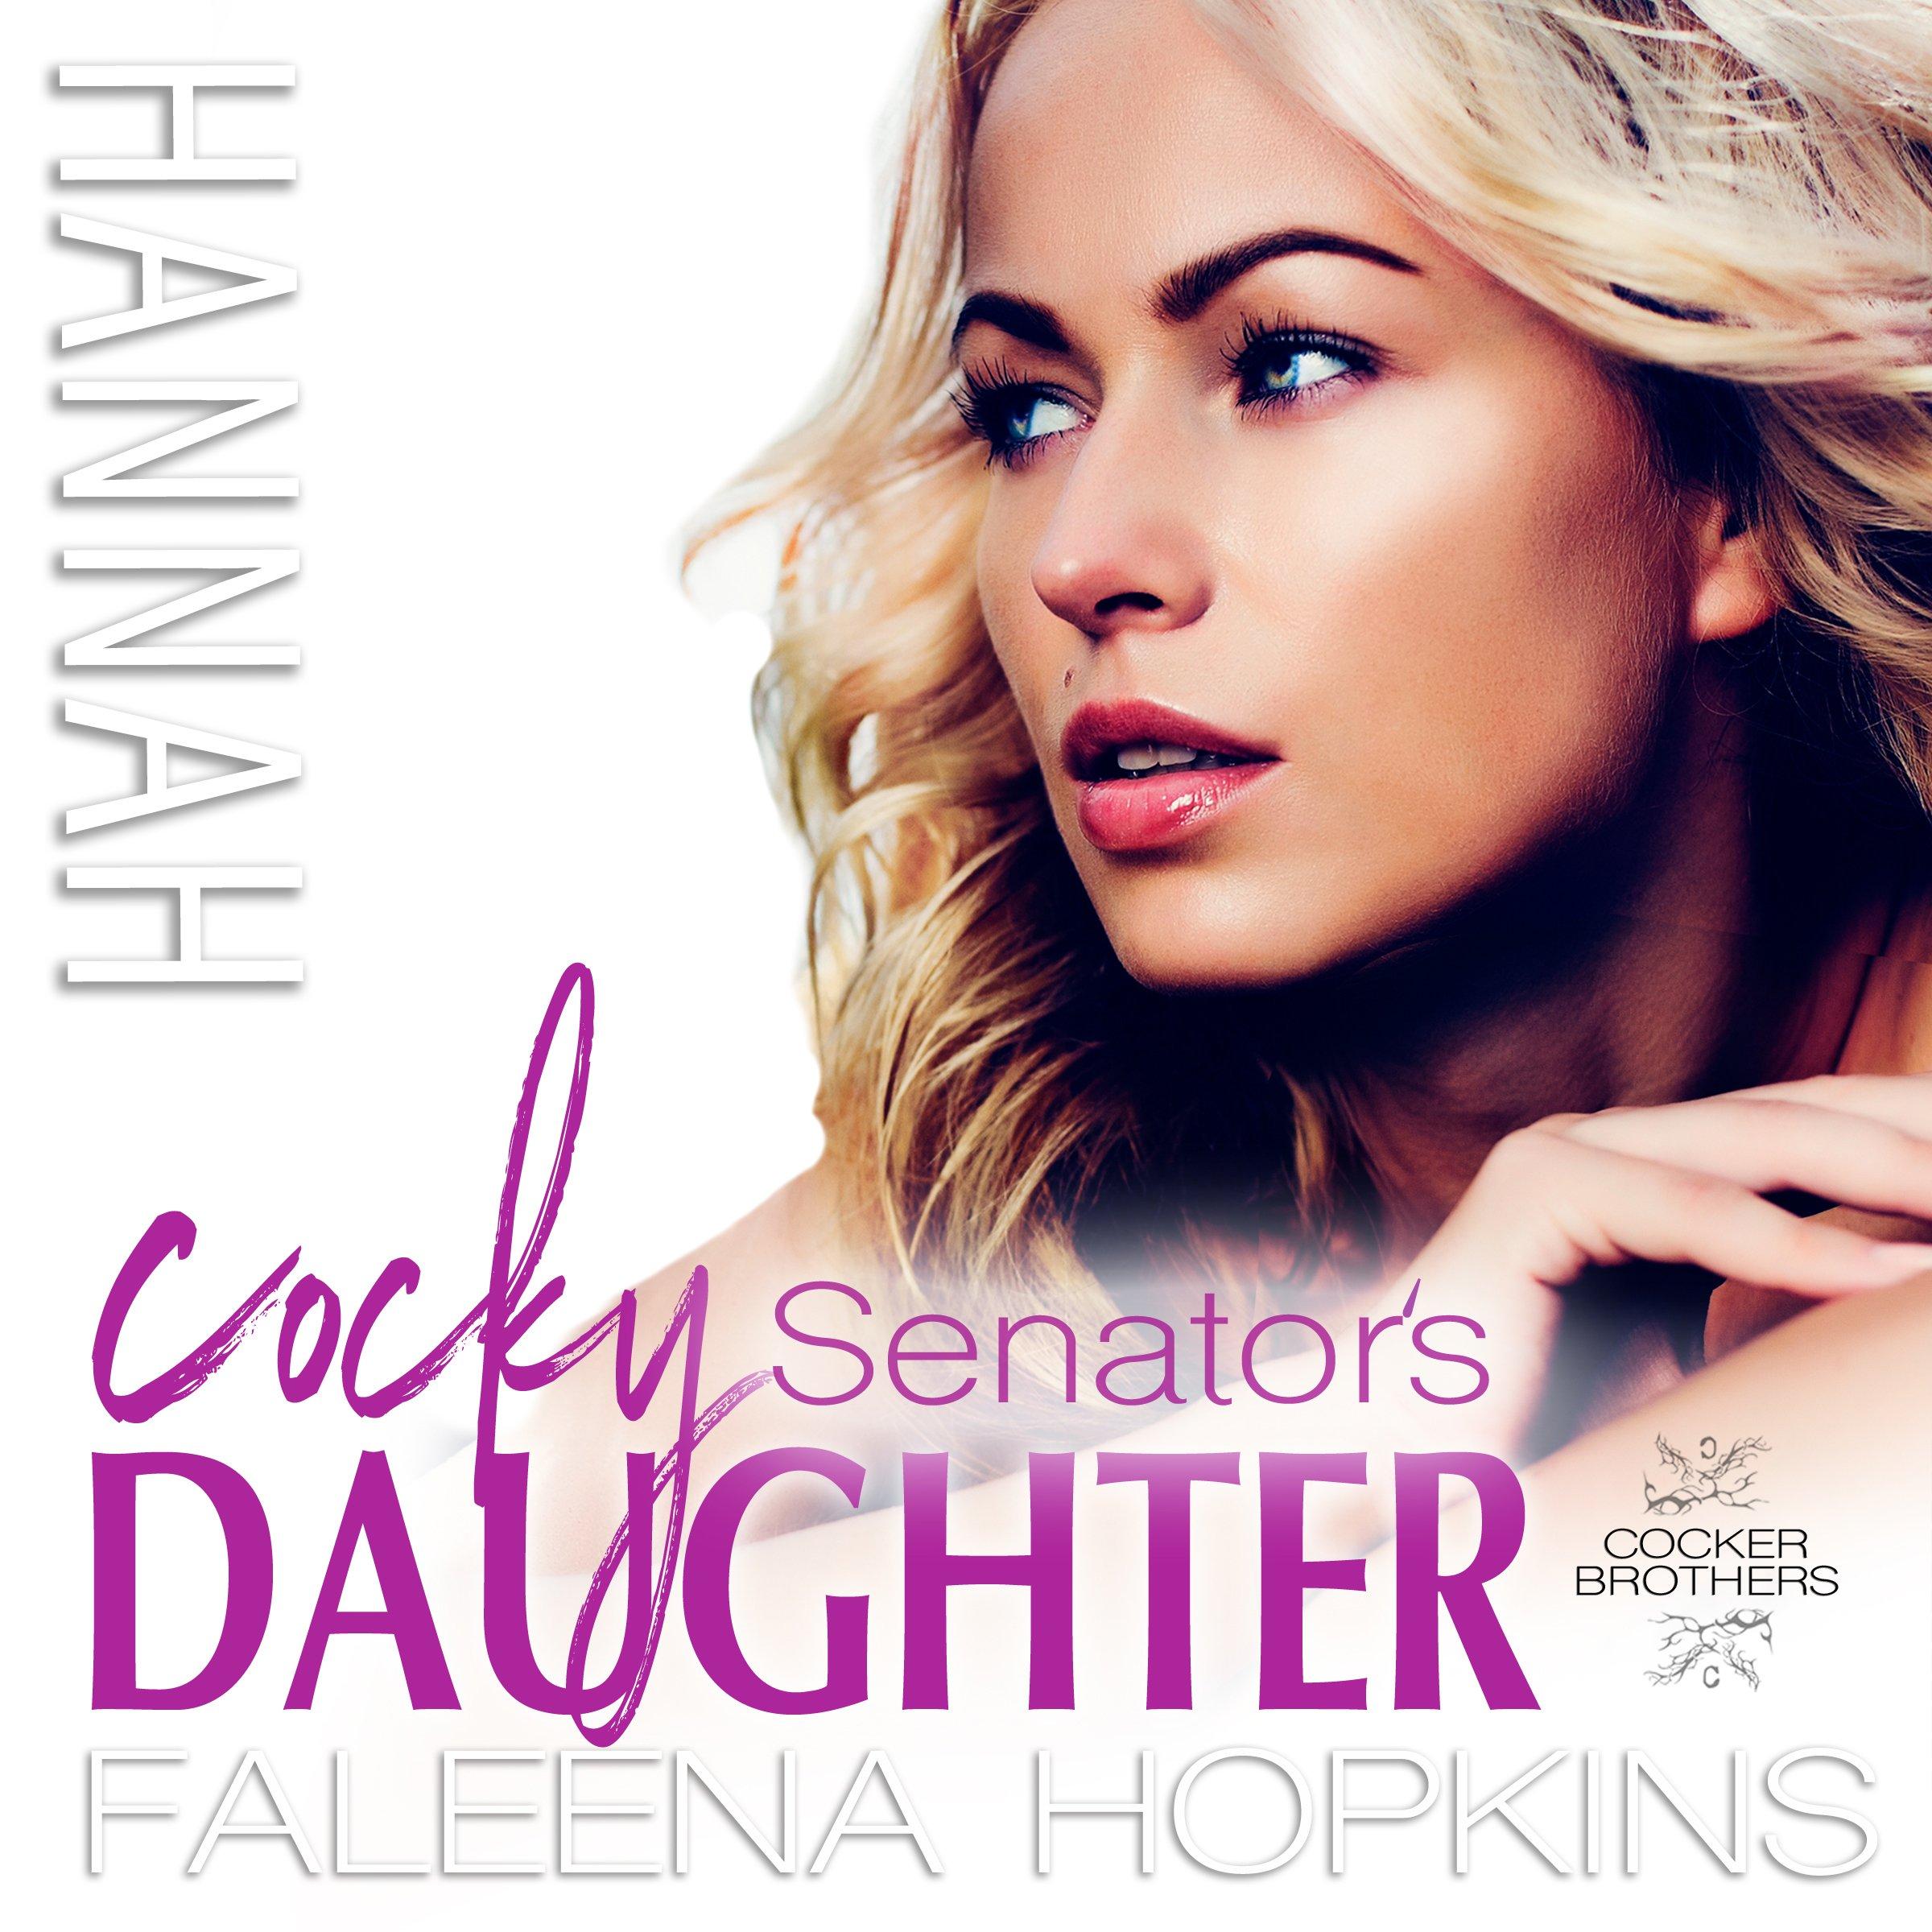 Cocky Senator's Daughter: Hannah Cocker: Cocker Brothers: The Cocky Series, Book 8